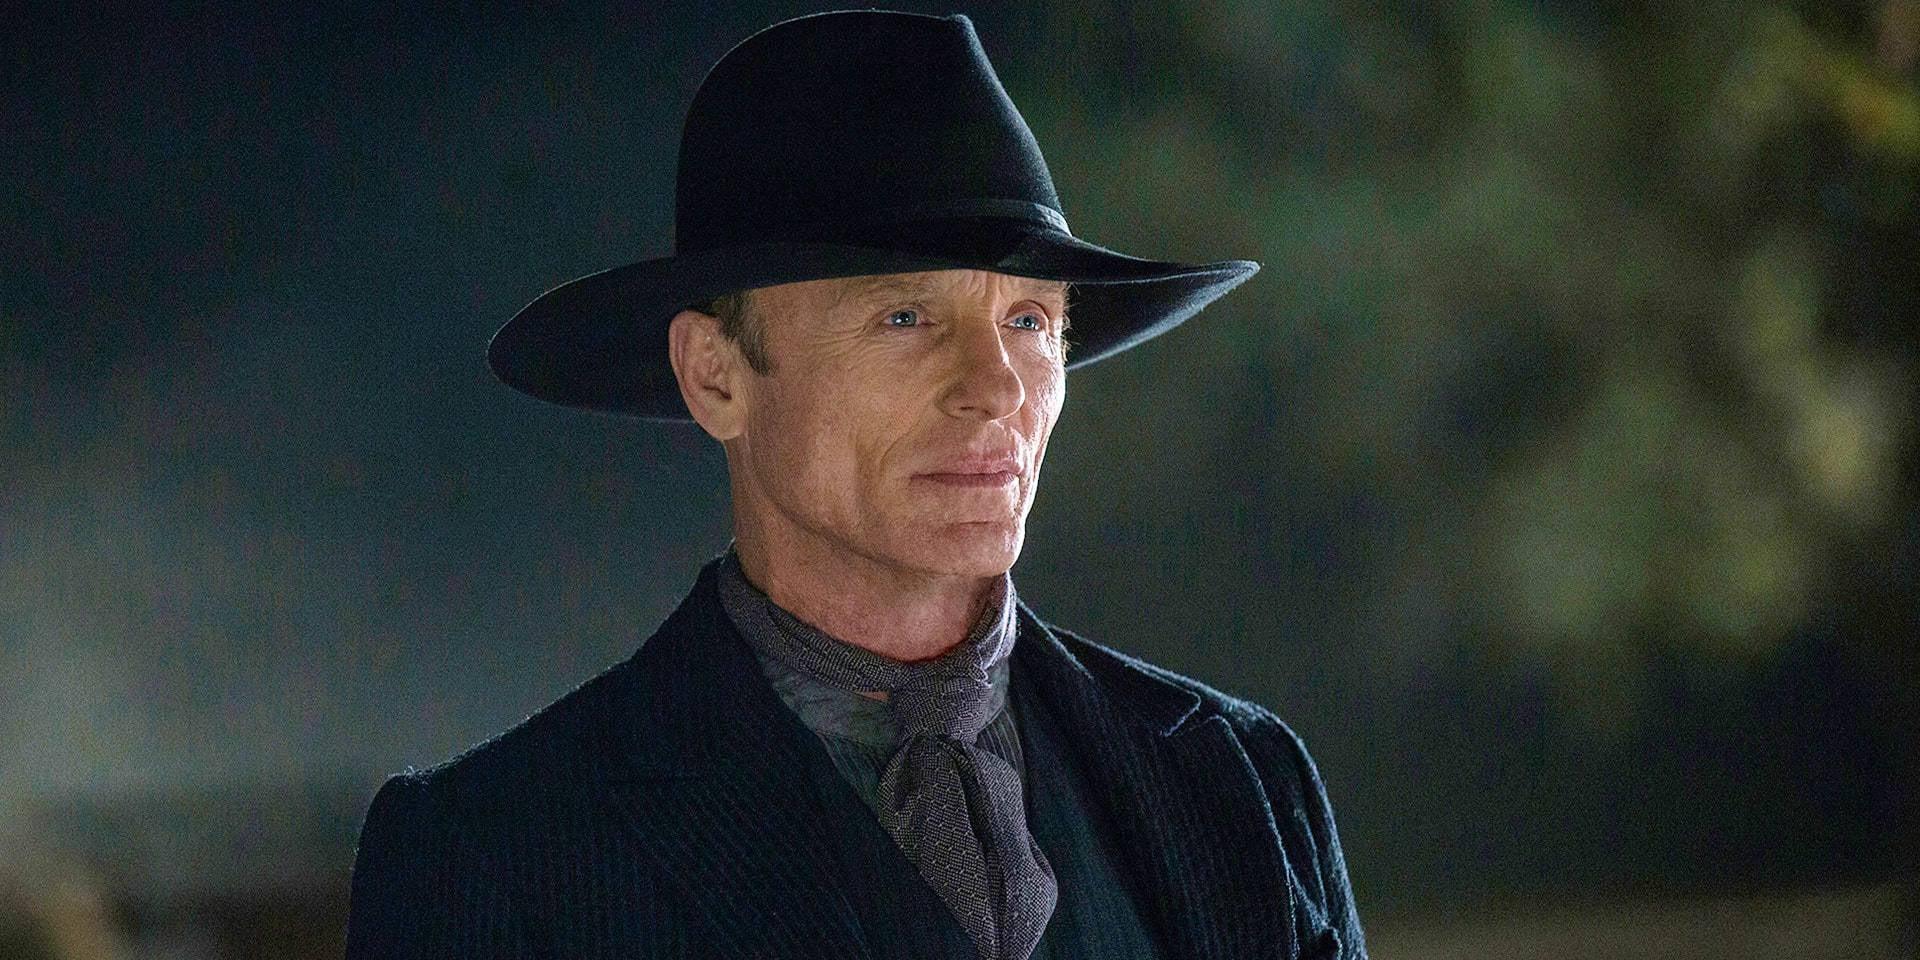 Westworld Season 2 Premiere Title Has Been Revealed